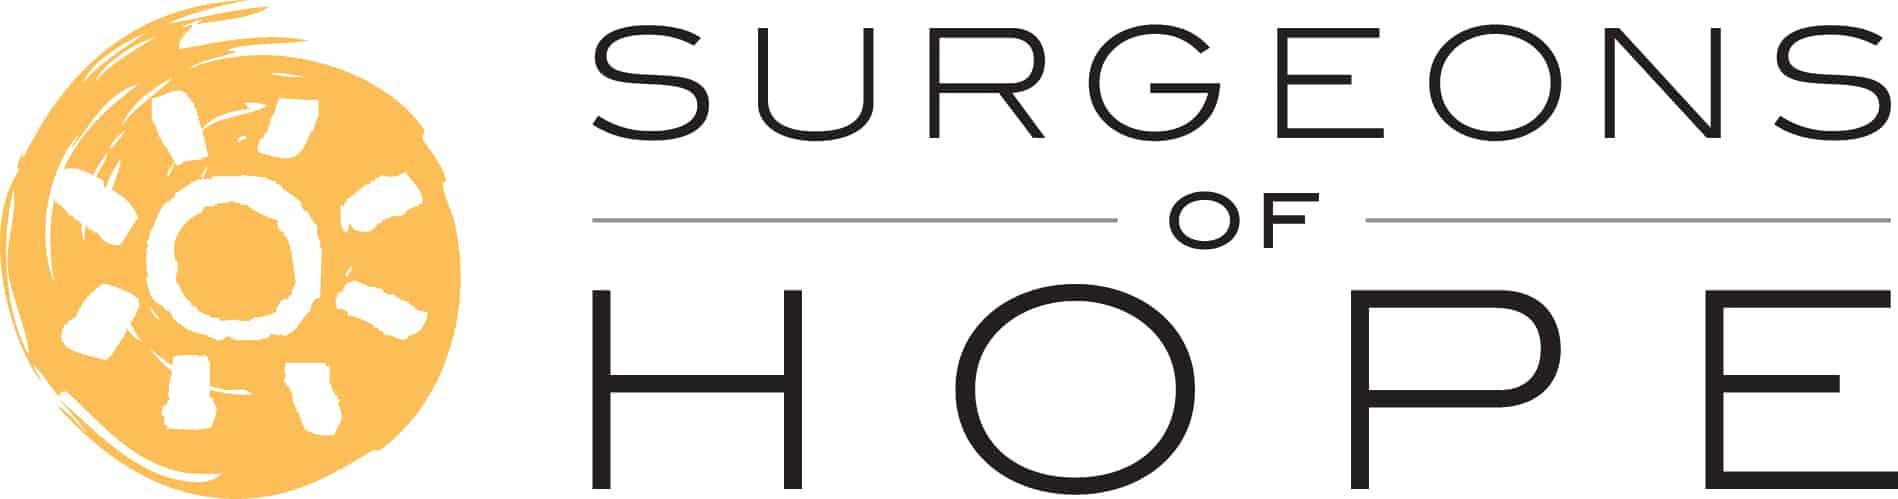 Surgeons of Hope